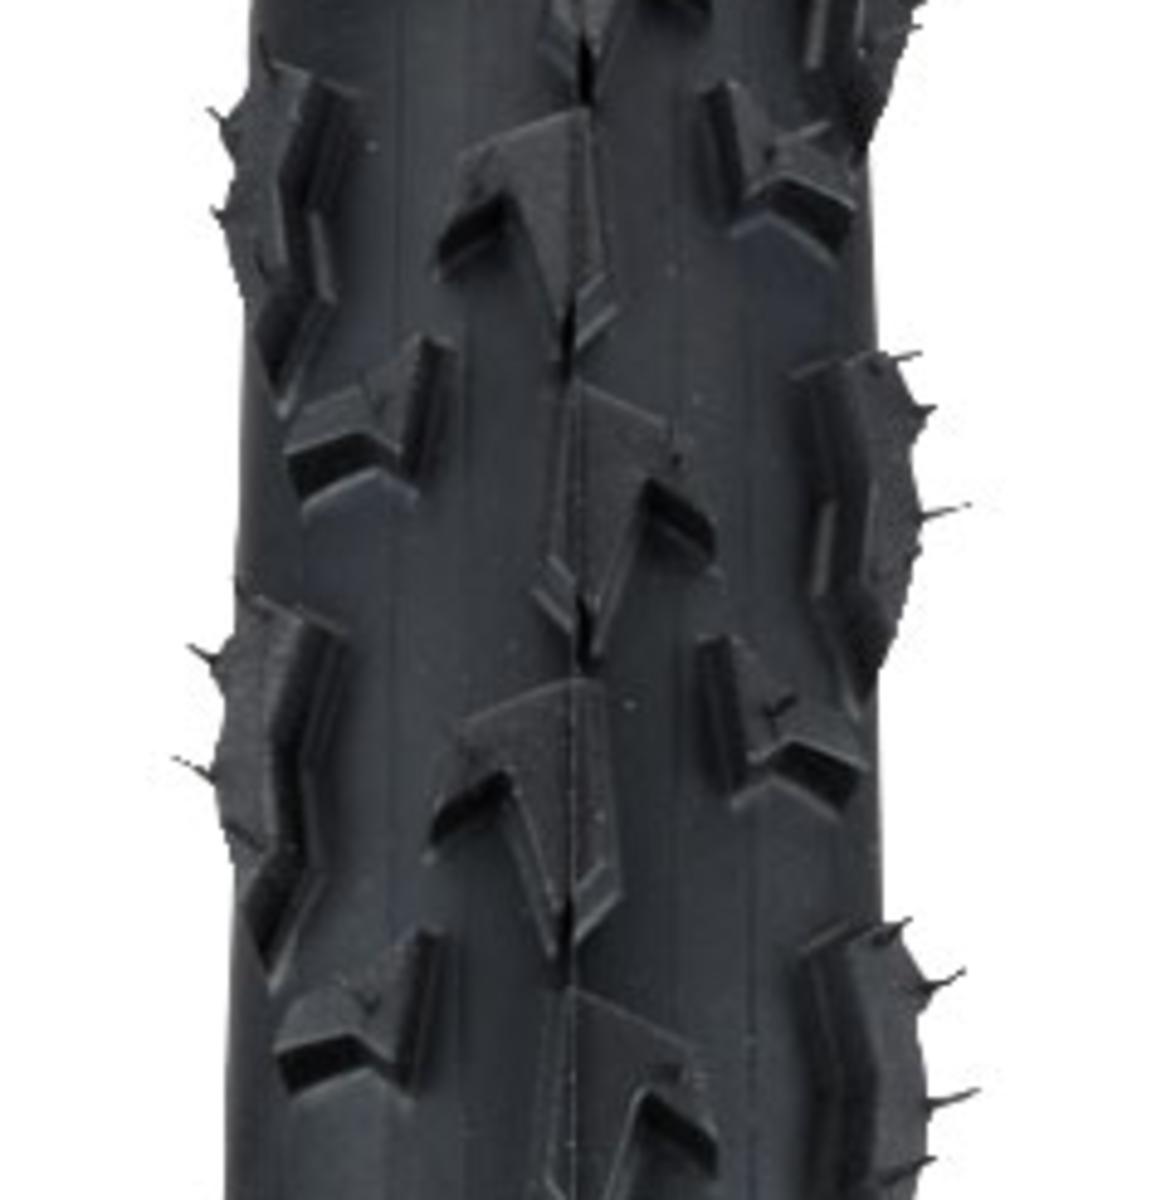 The tread pattern of the Vittoria Cross XL Pro